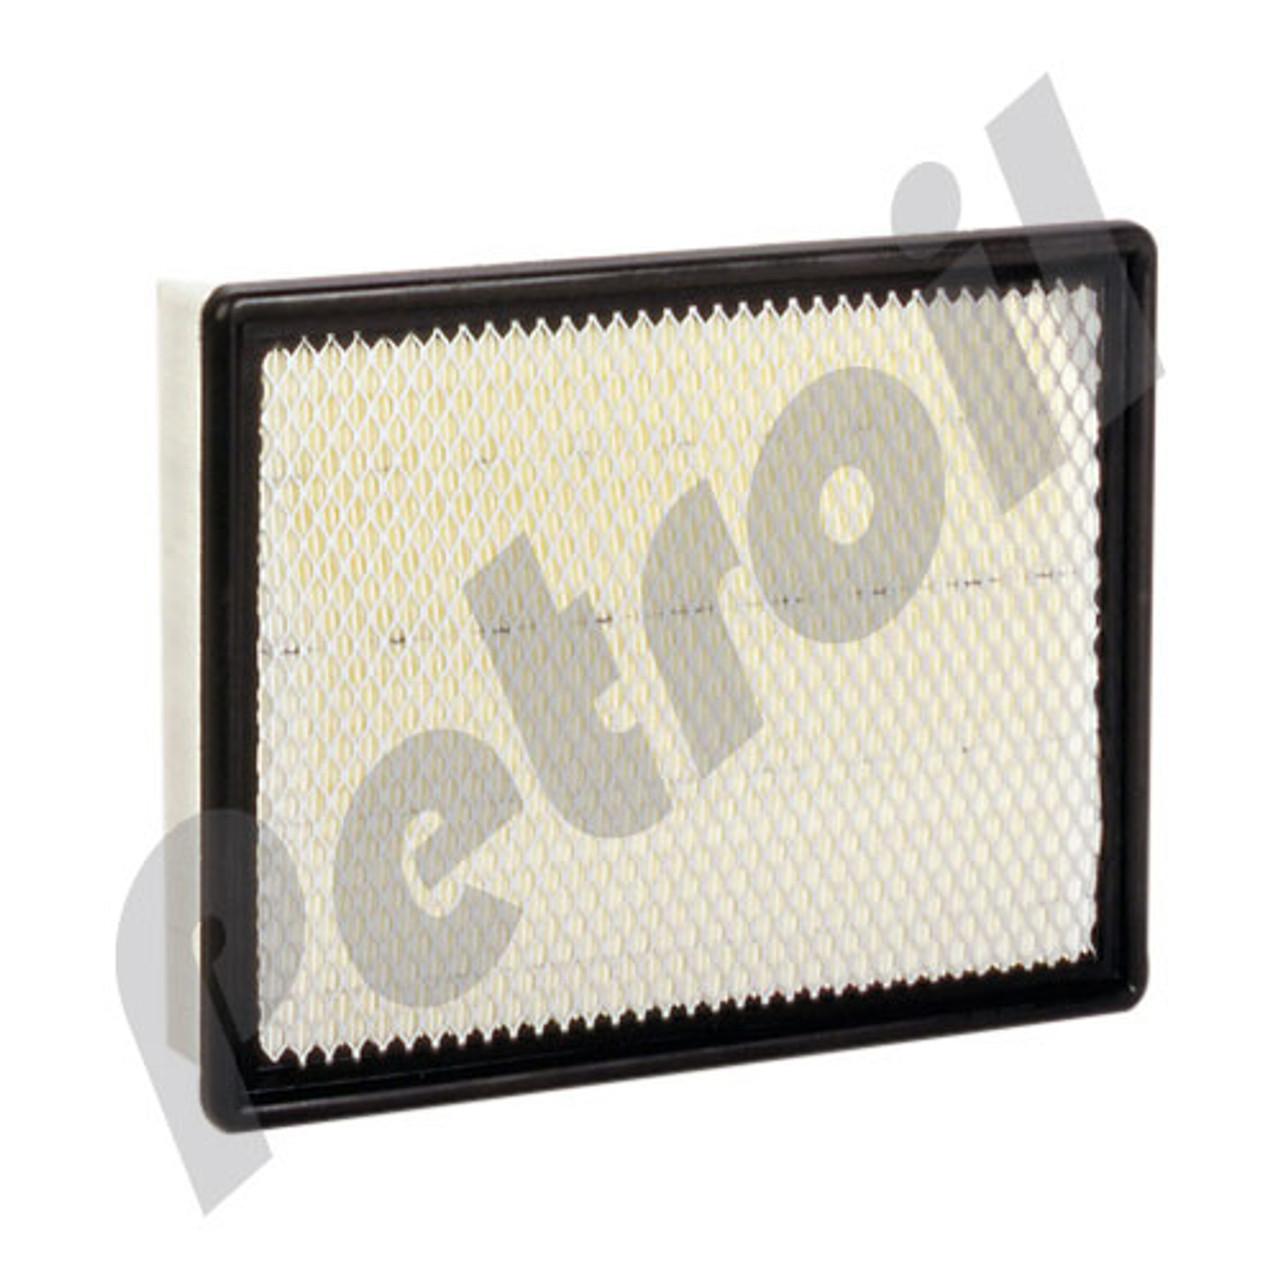 Wix 42488 HD Air Filter